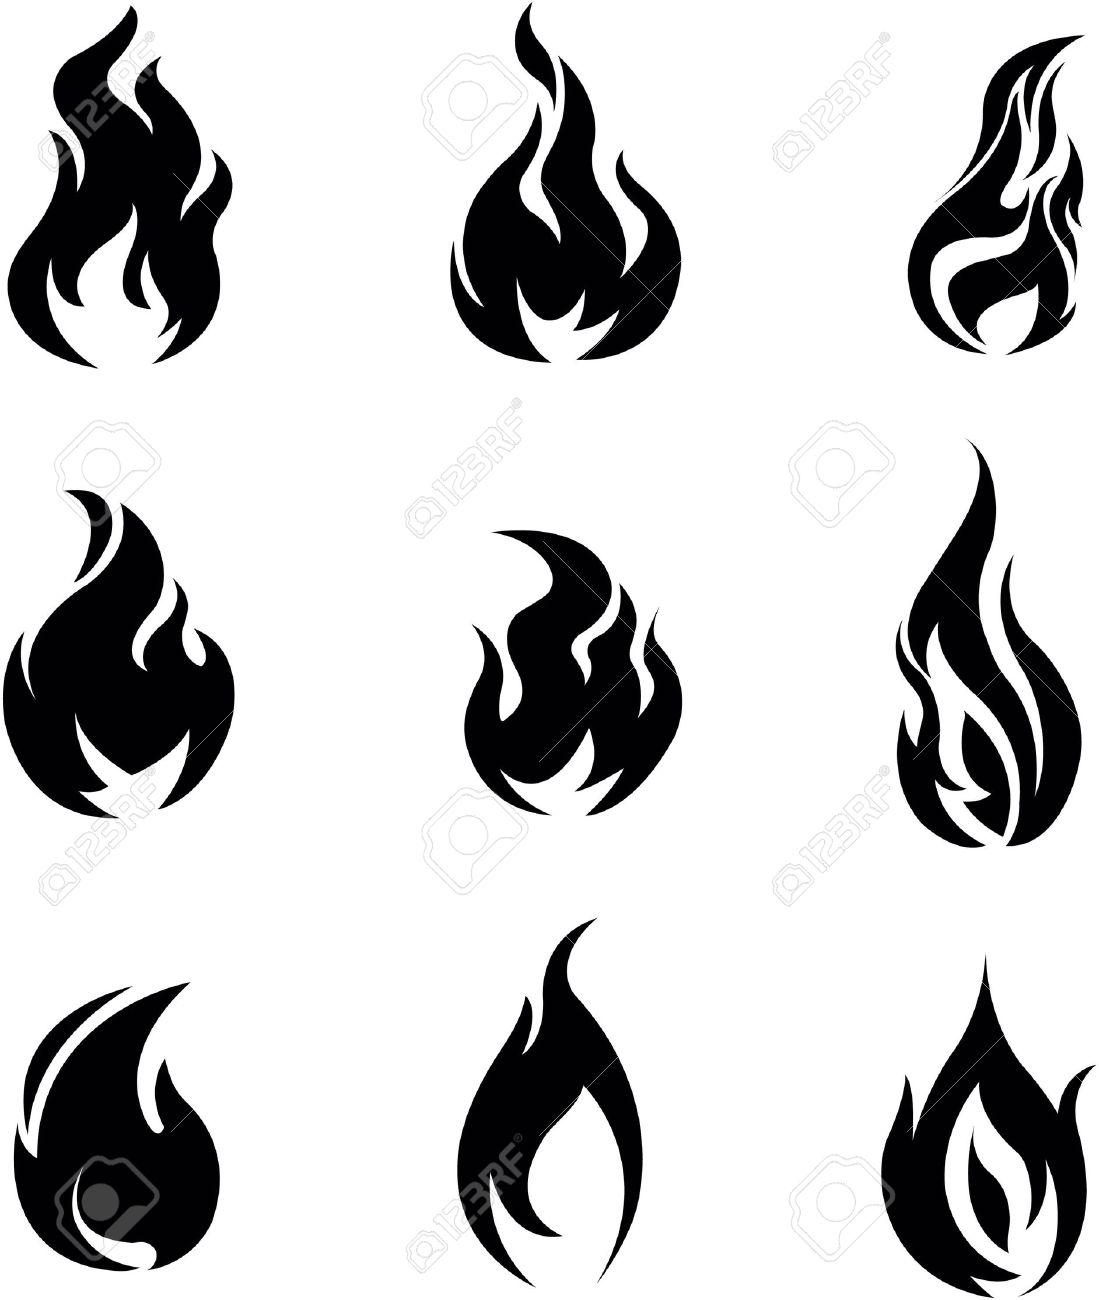 Fire symbol - 46370463